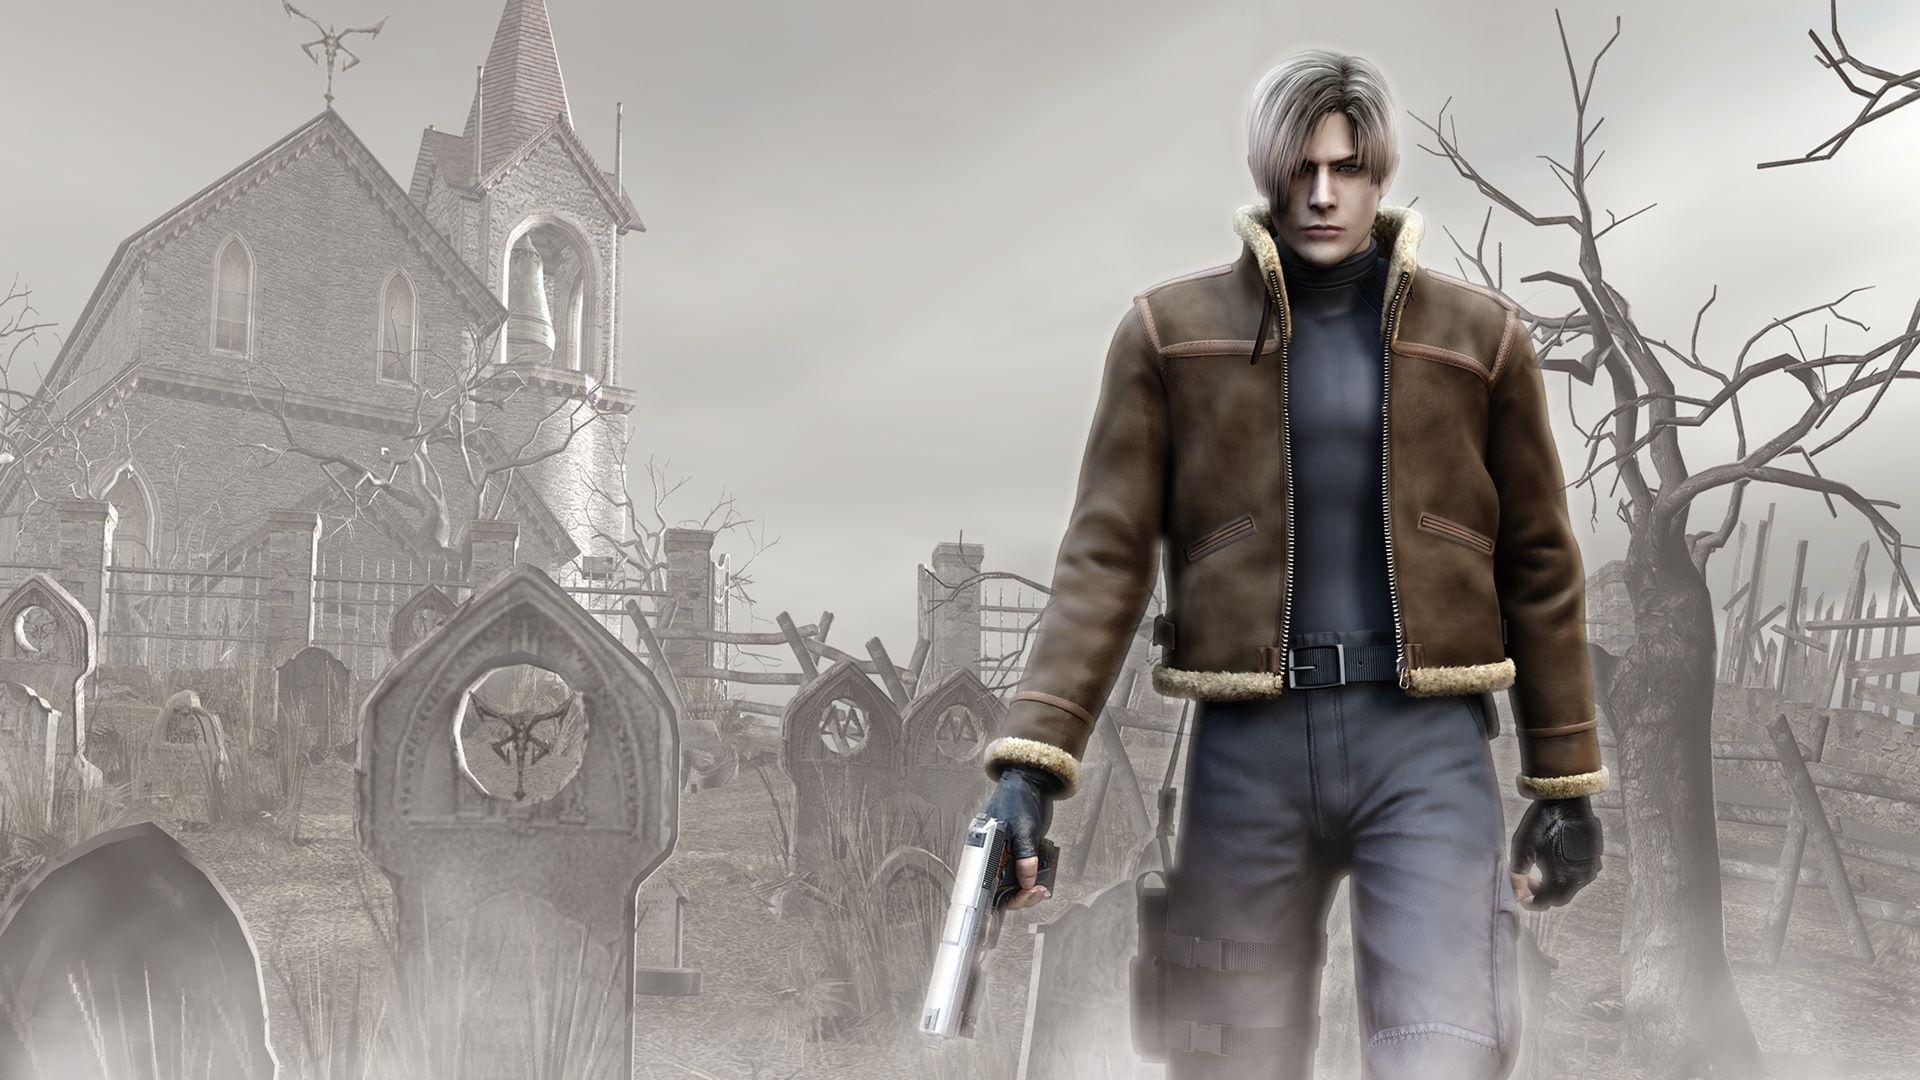 Tre Resident Evil-spel kommer till Nintendo Switch